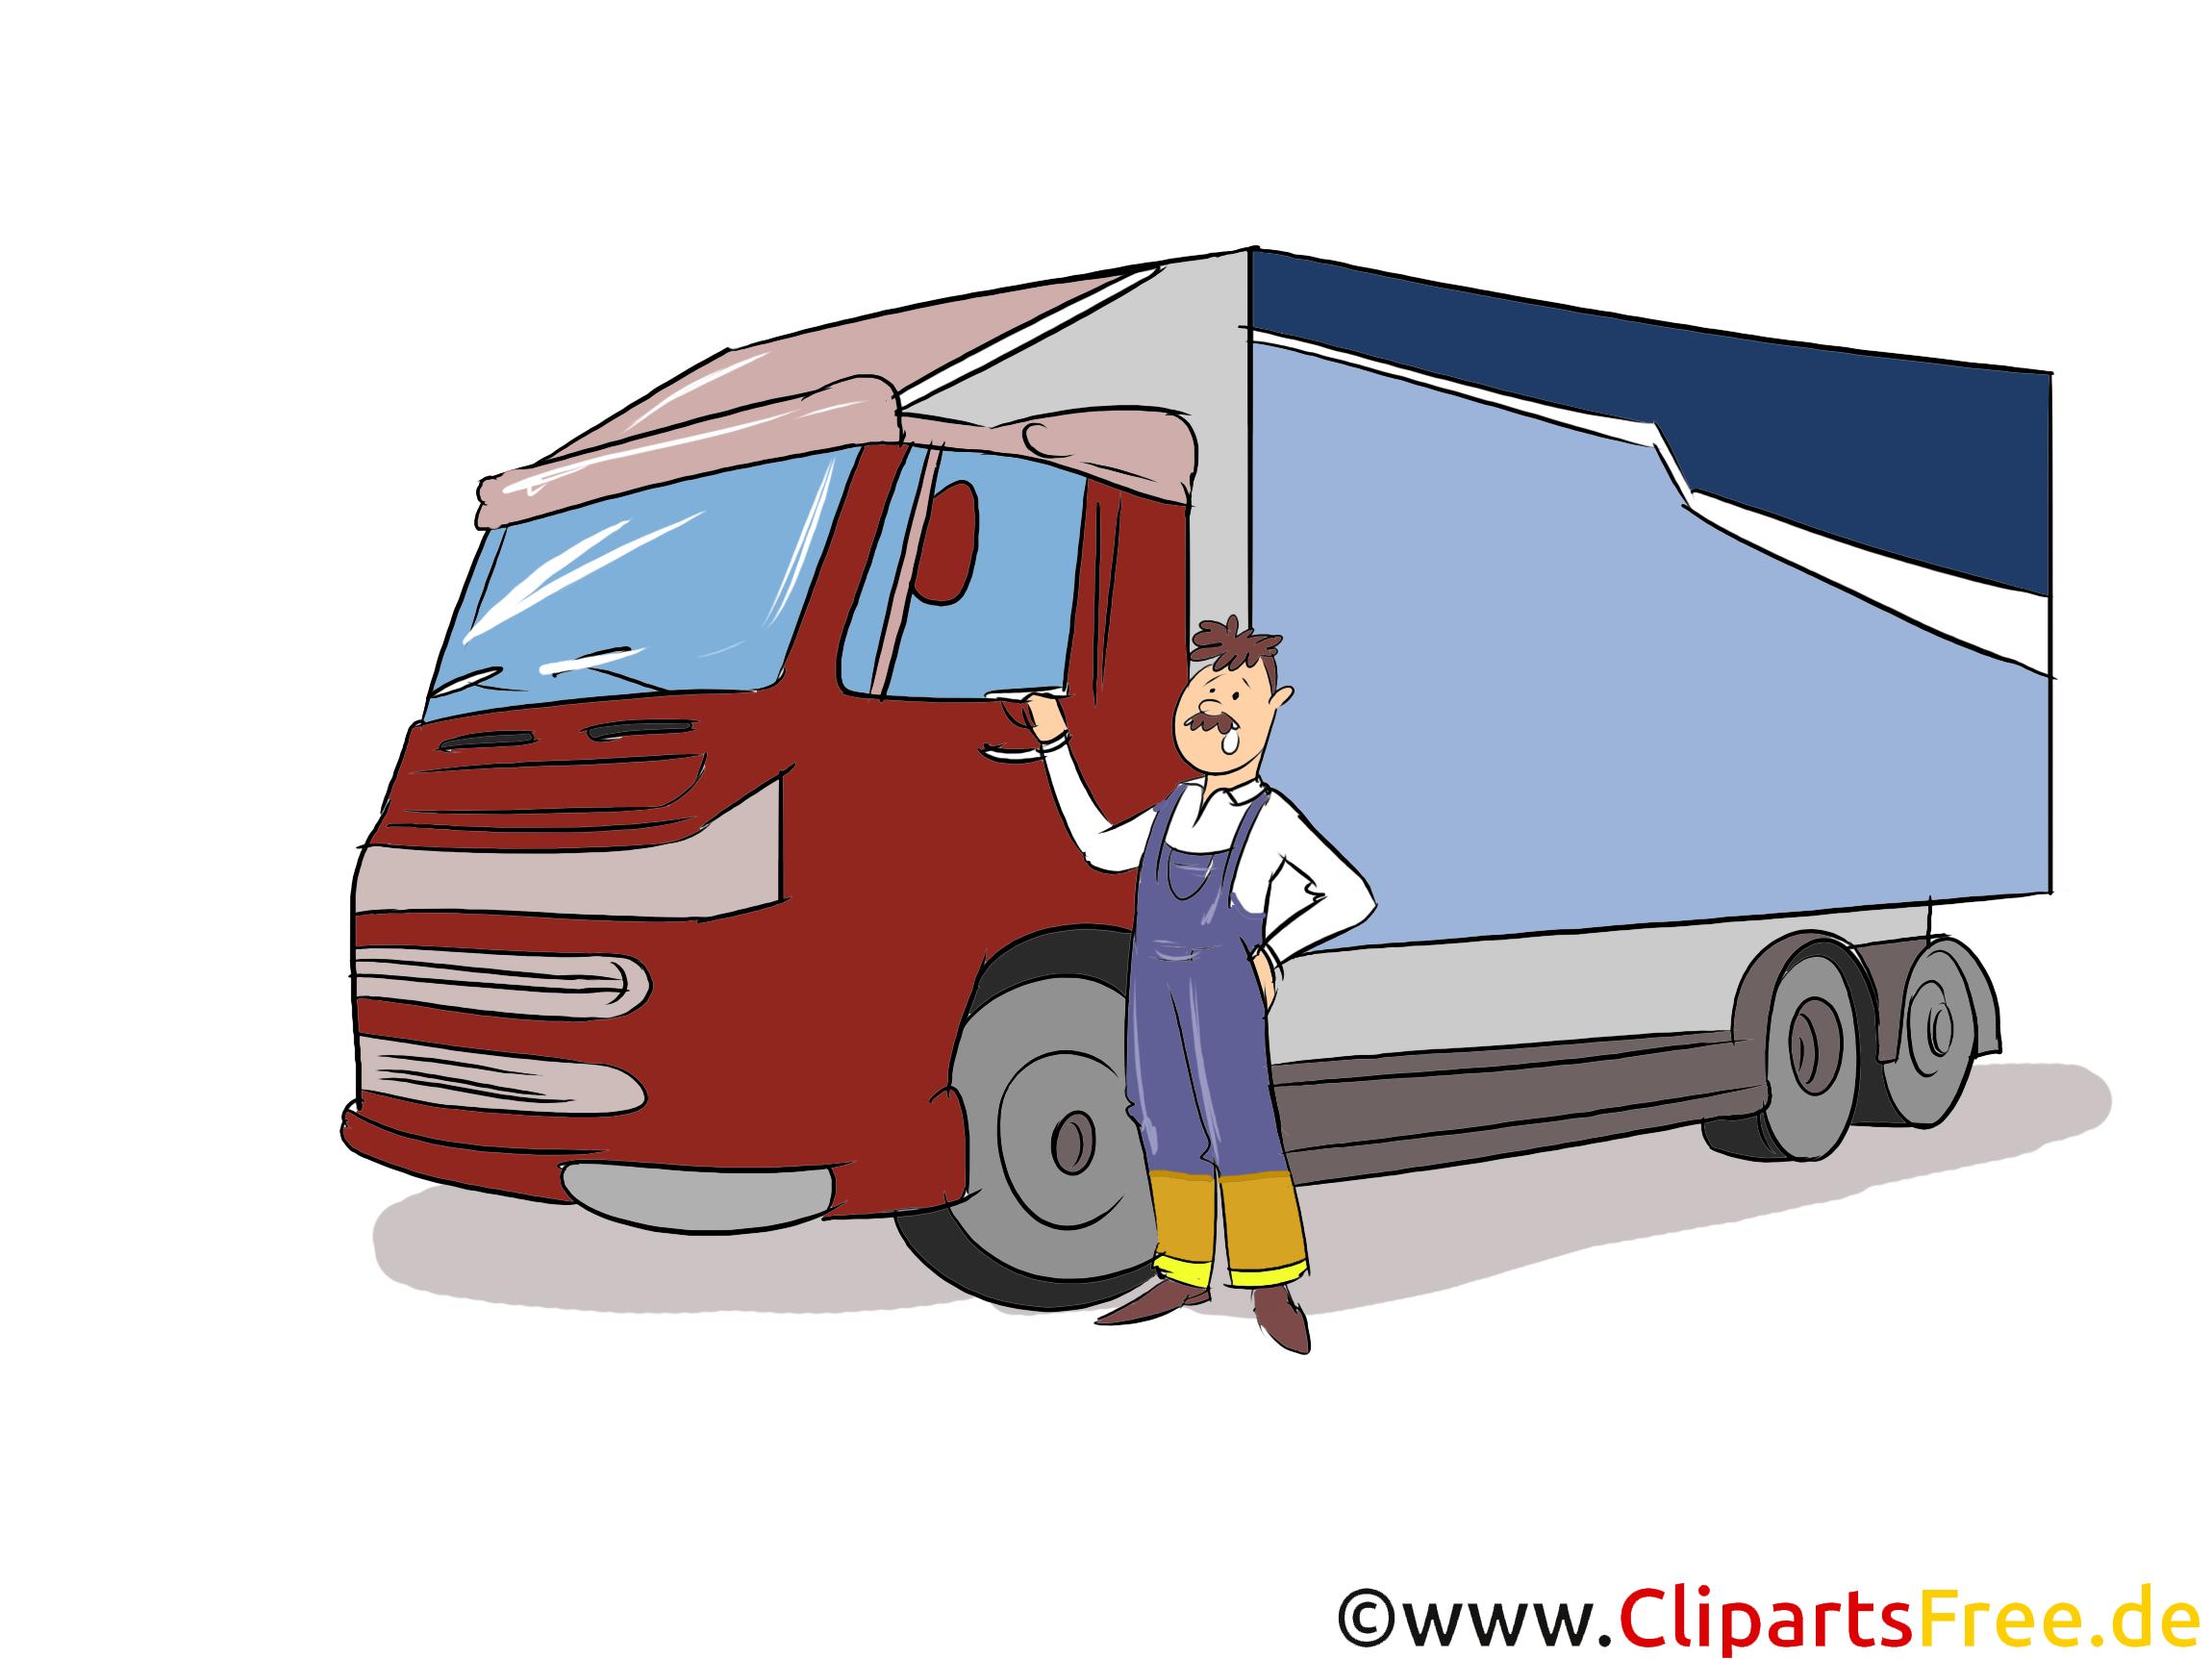 Berufskraftfahrer Clipart, Bild, Grafik zum Thema Ausbildungsberufe